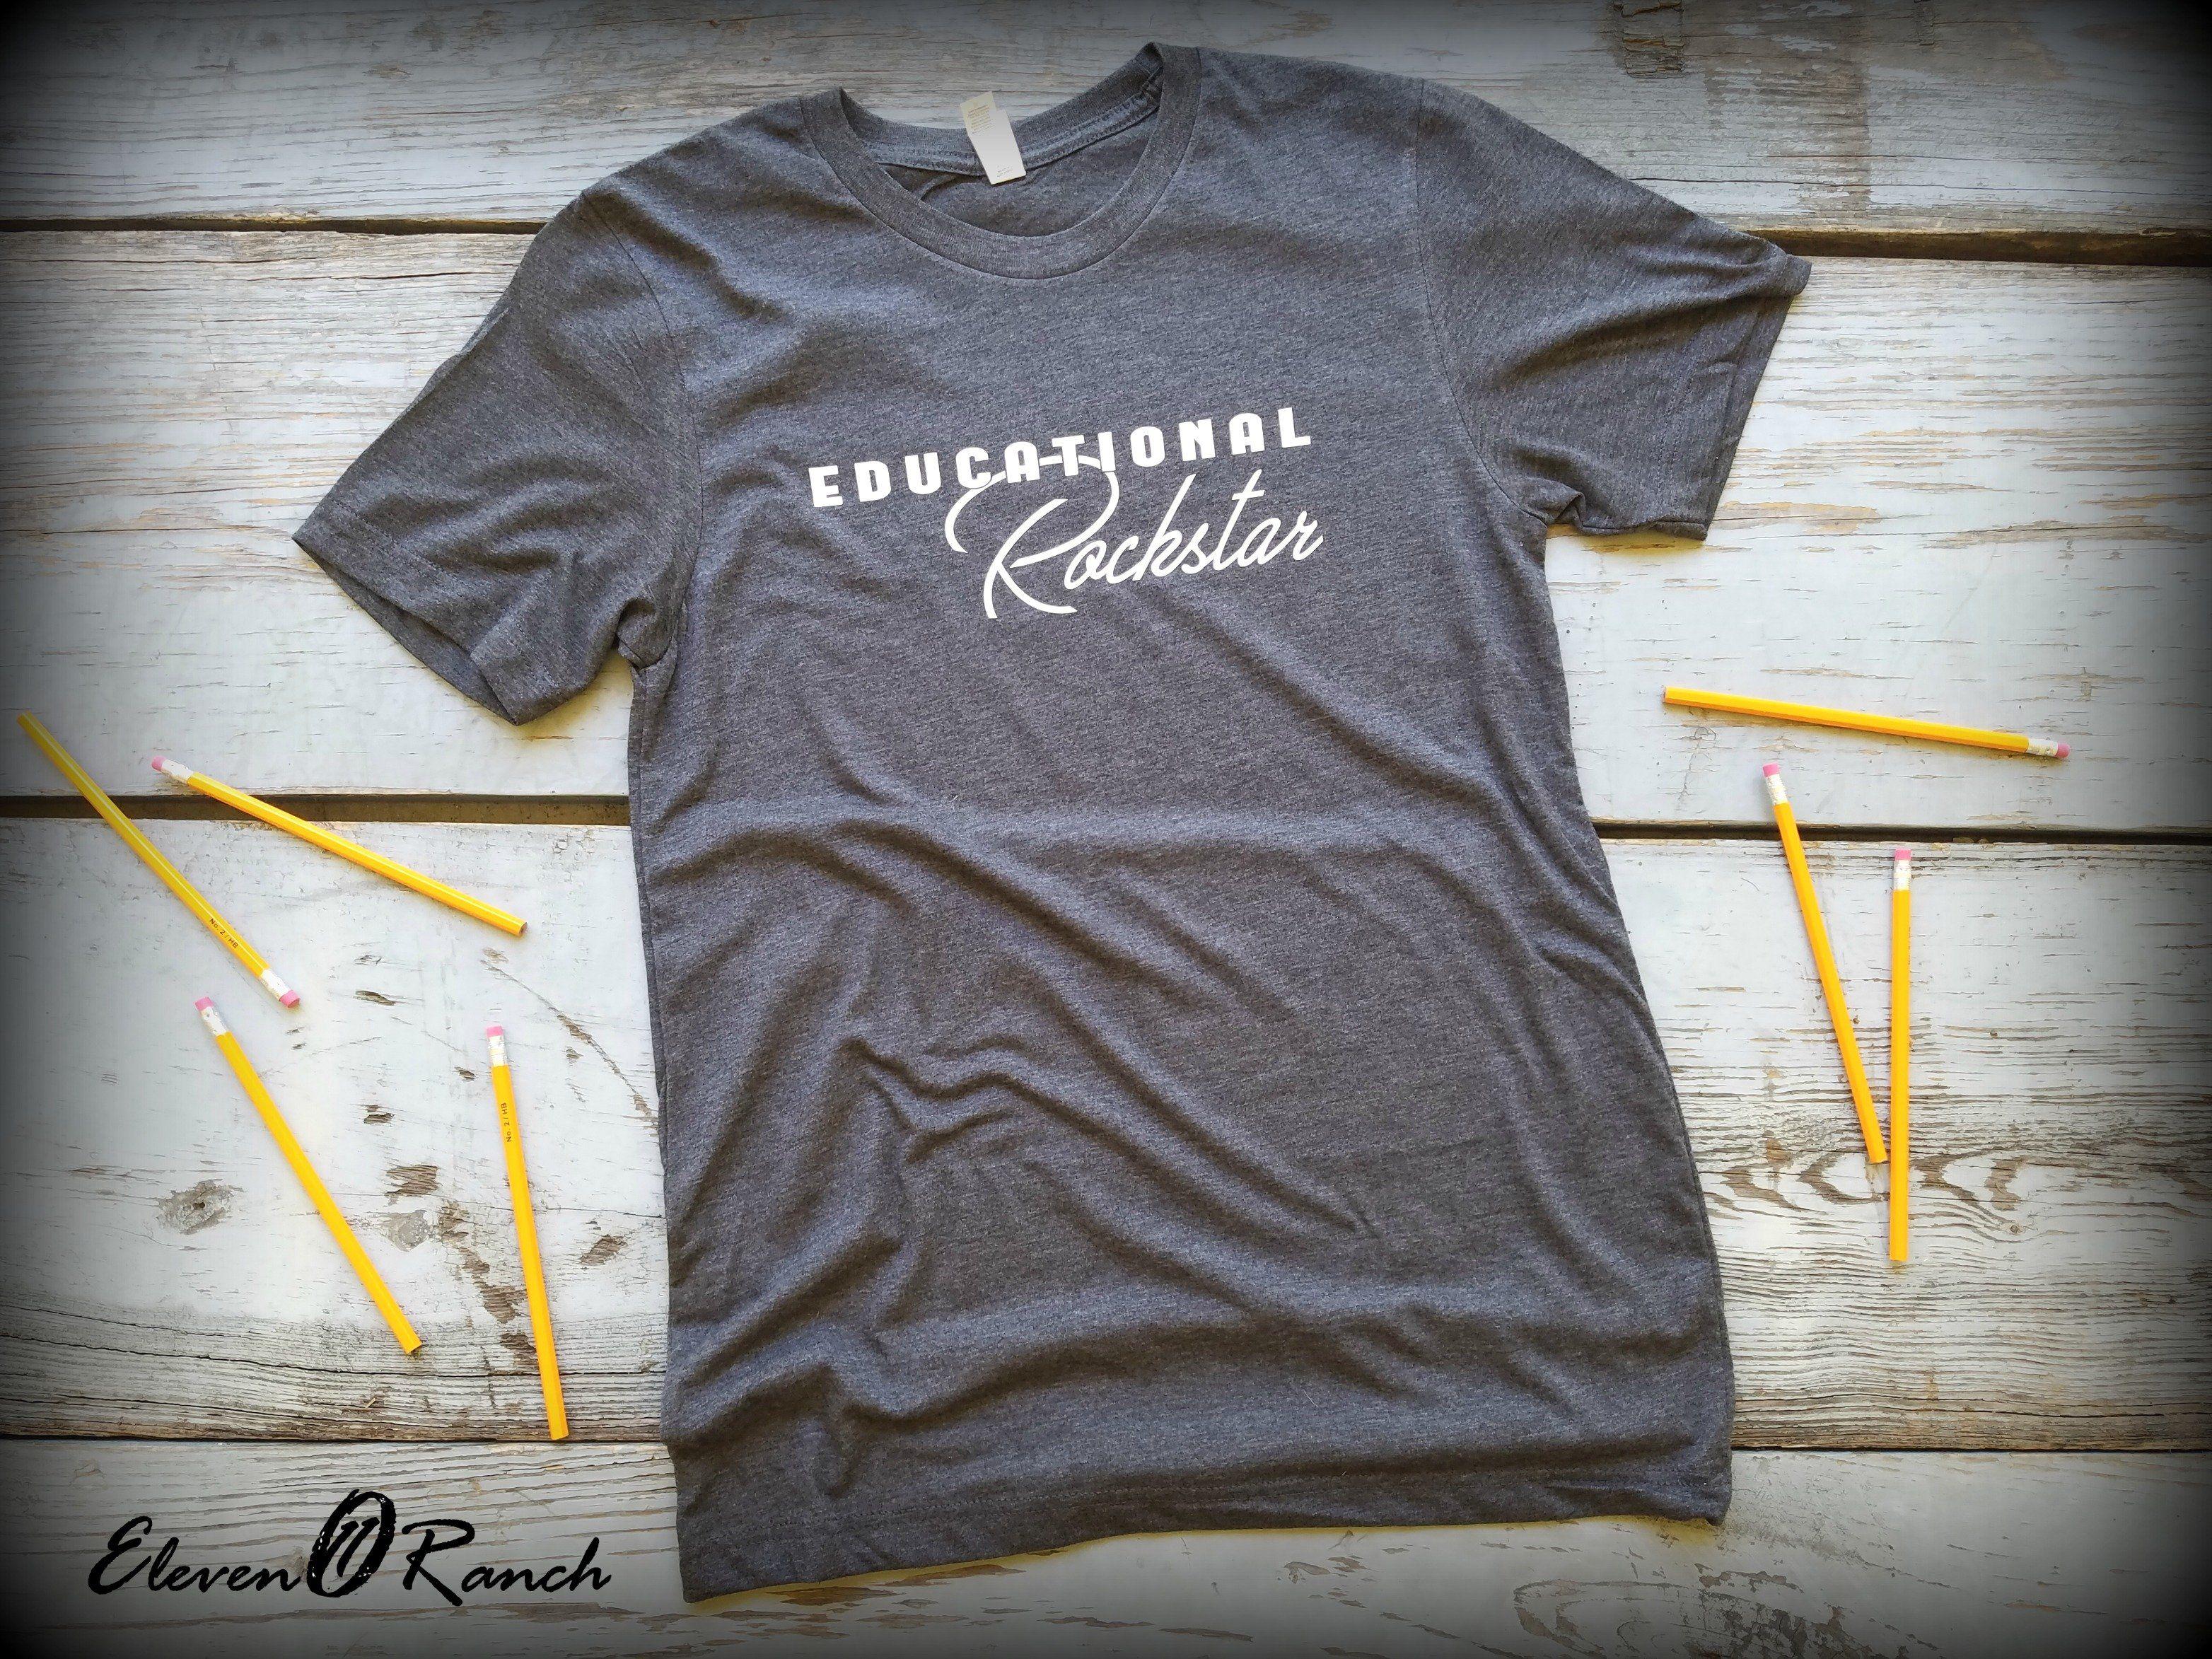 Teacher Educational Rockstar Size Medium Only Shirt Sale Tees Mens Tops